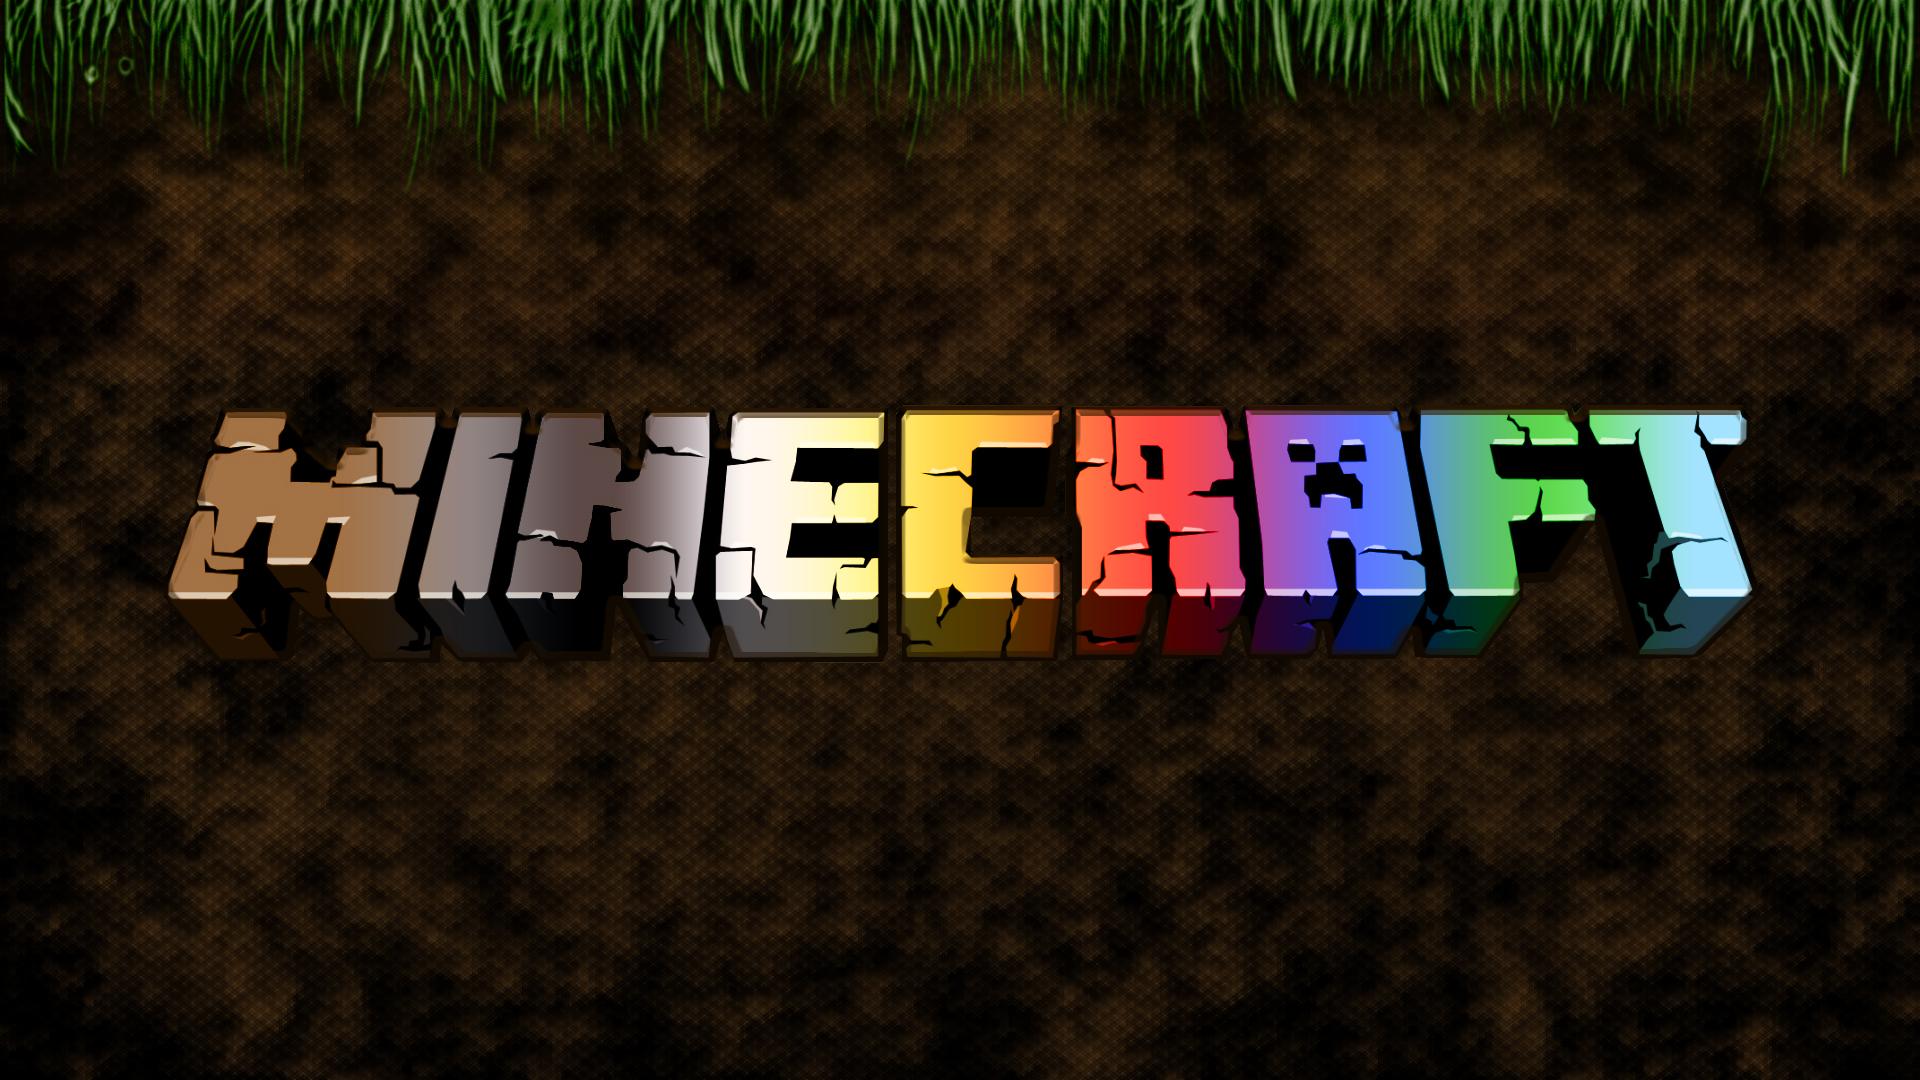 Cool Minecraft Wallpaper